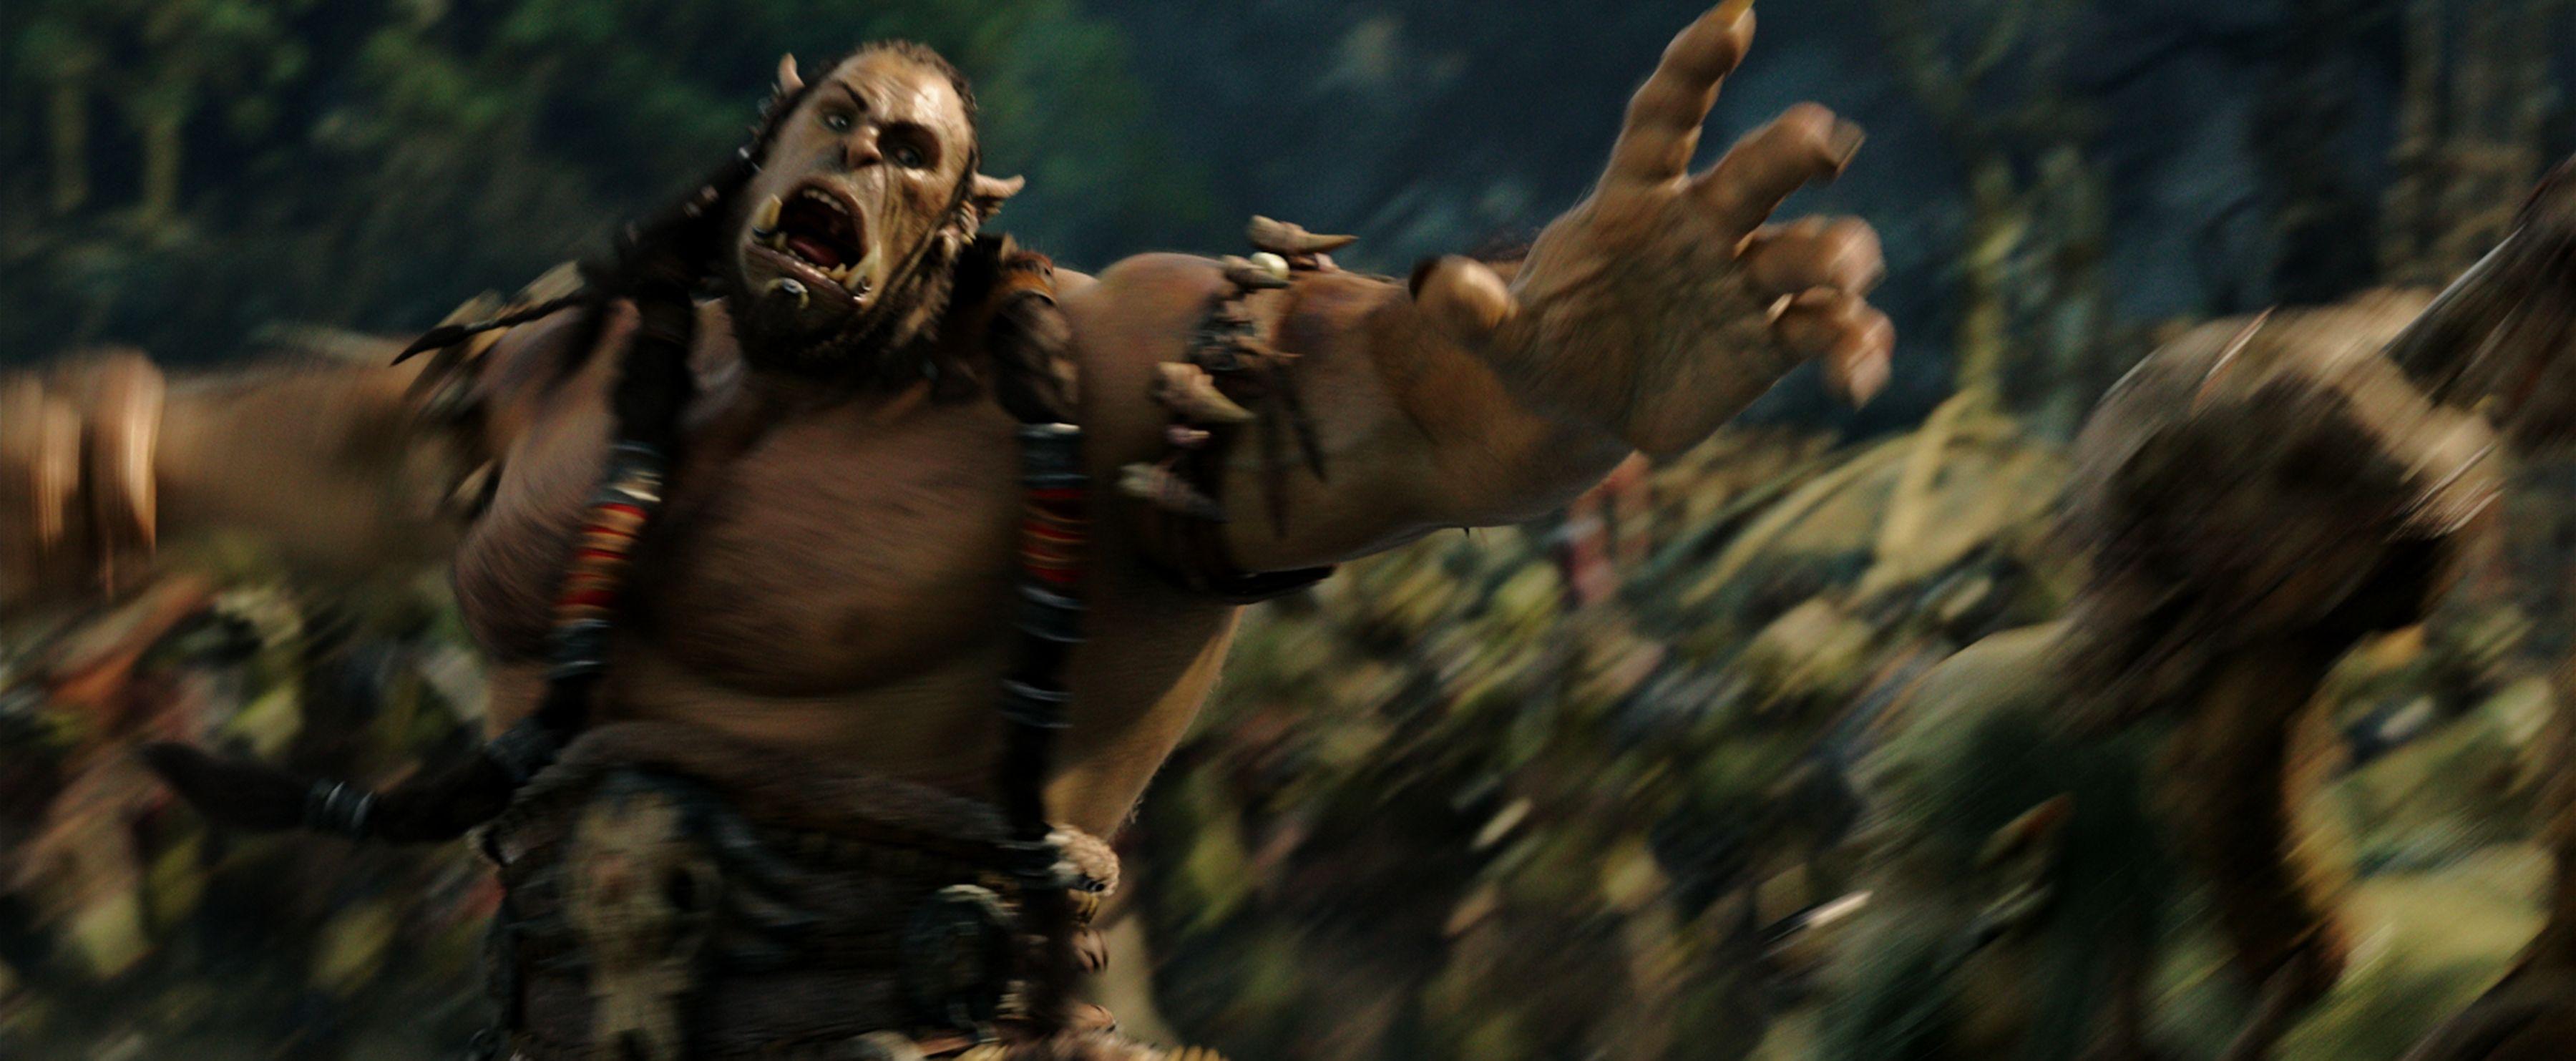 Warcraft Movie Explained By Director Duncan Jones Collider